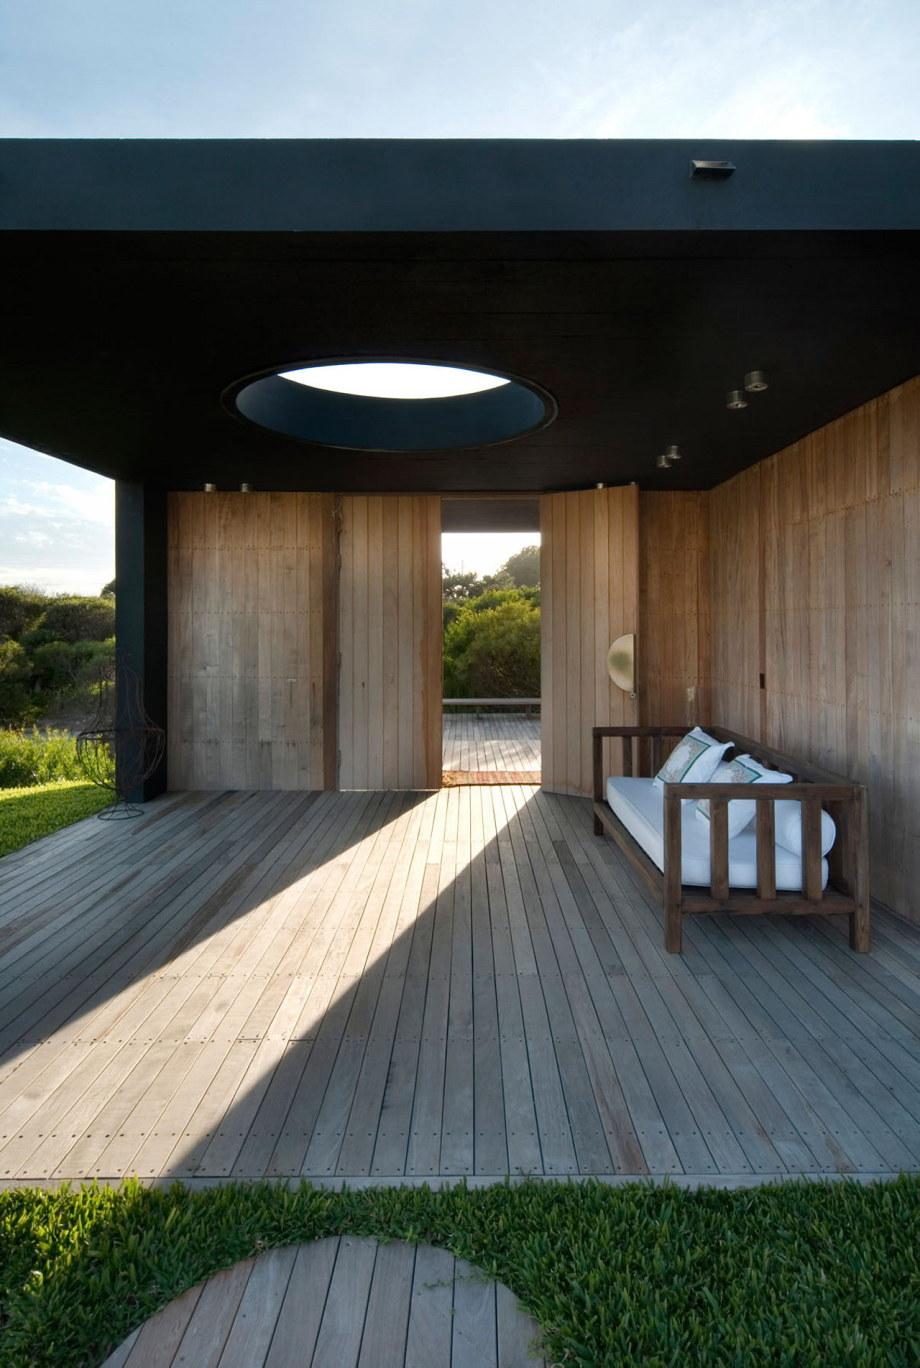 The beach house La Boyita Residence by Martin Gomez Arguitectos, Uruguay 6